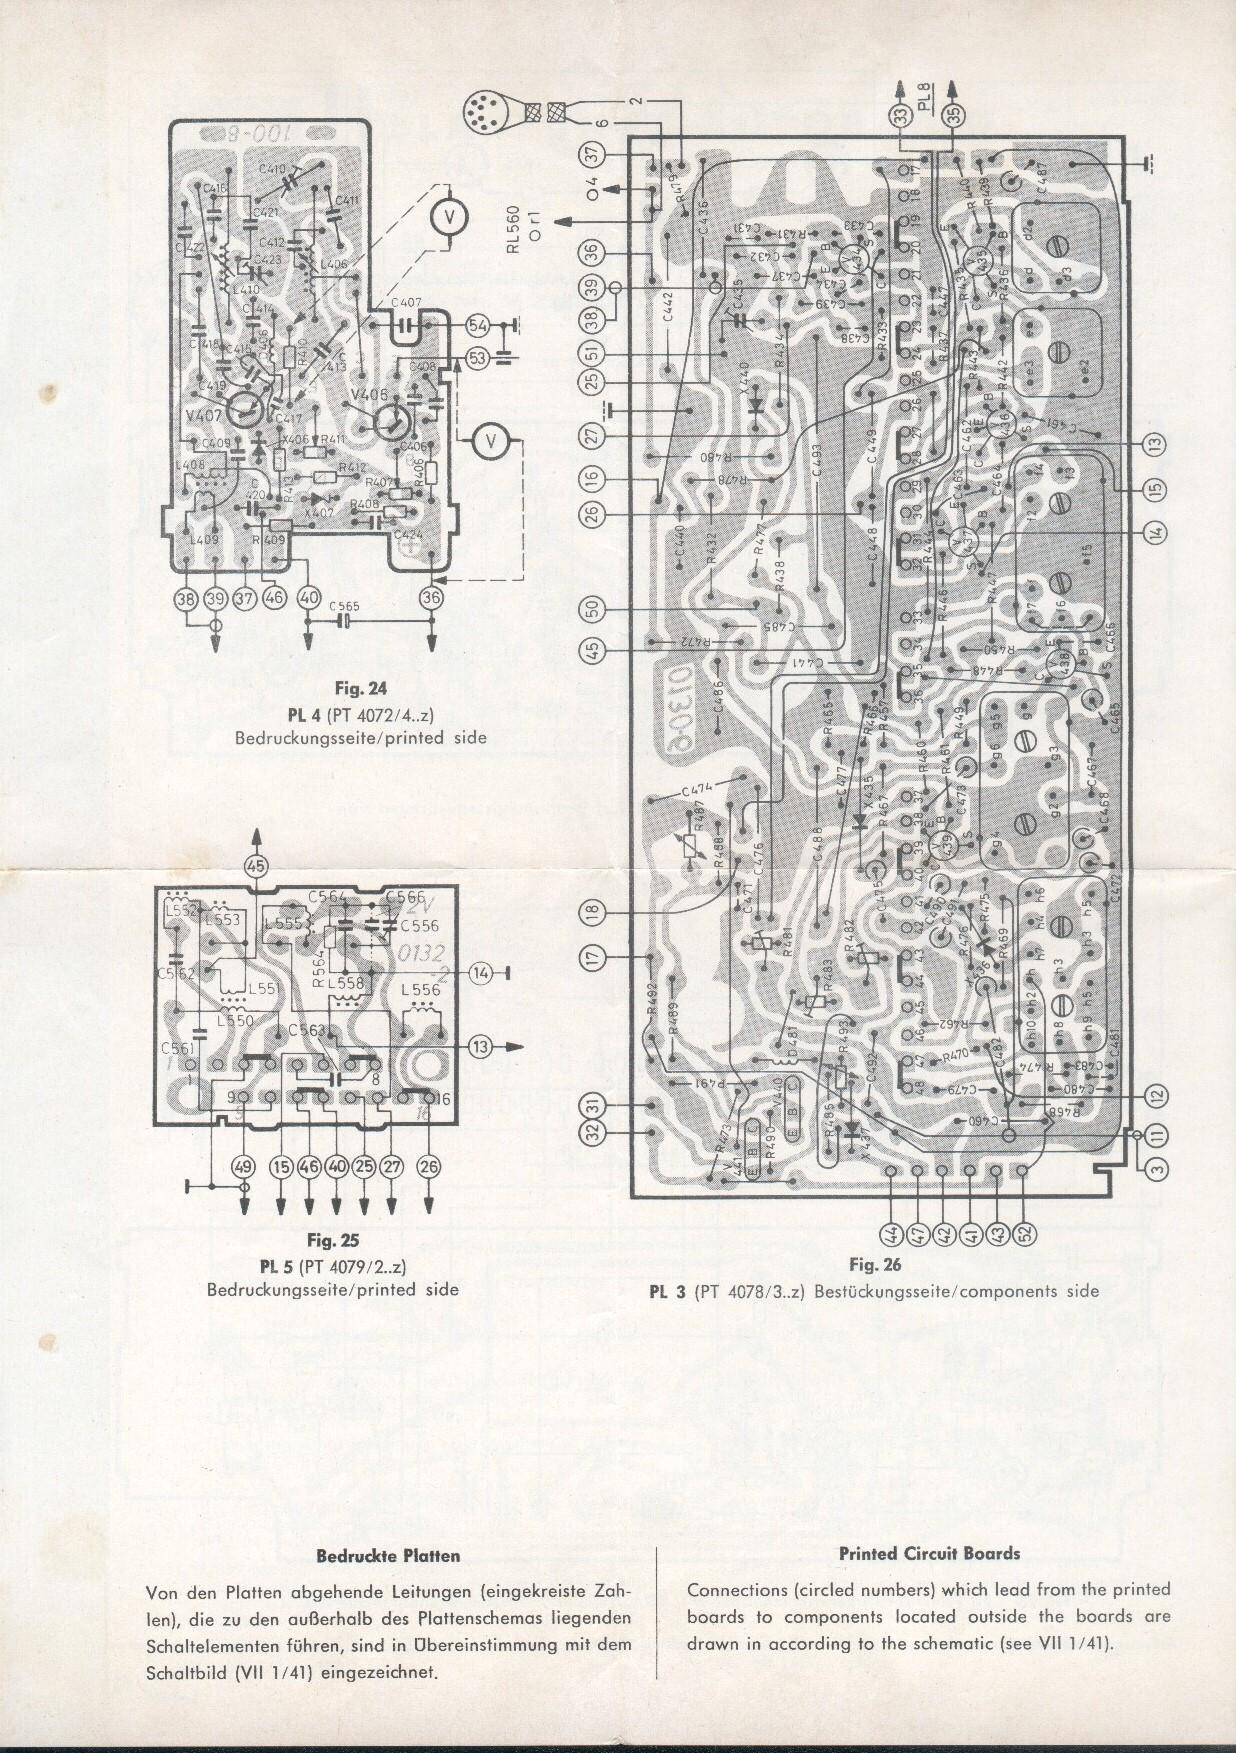 1965 Blaupunkt Koln Schematics Printed Circuit Board